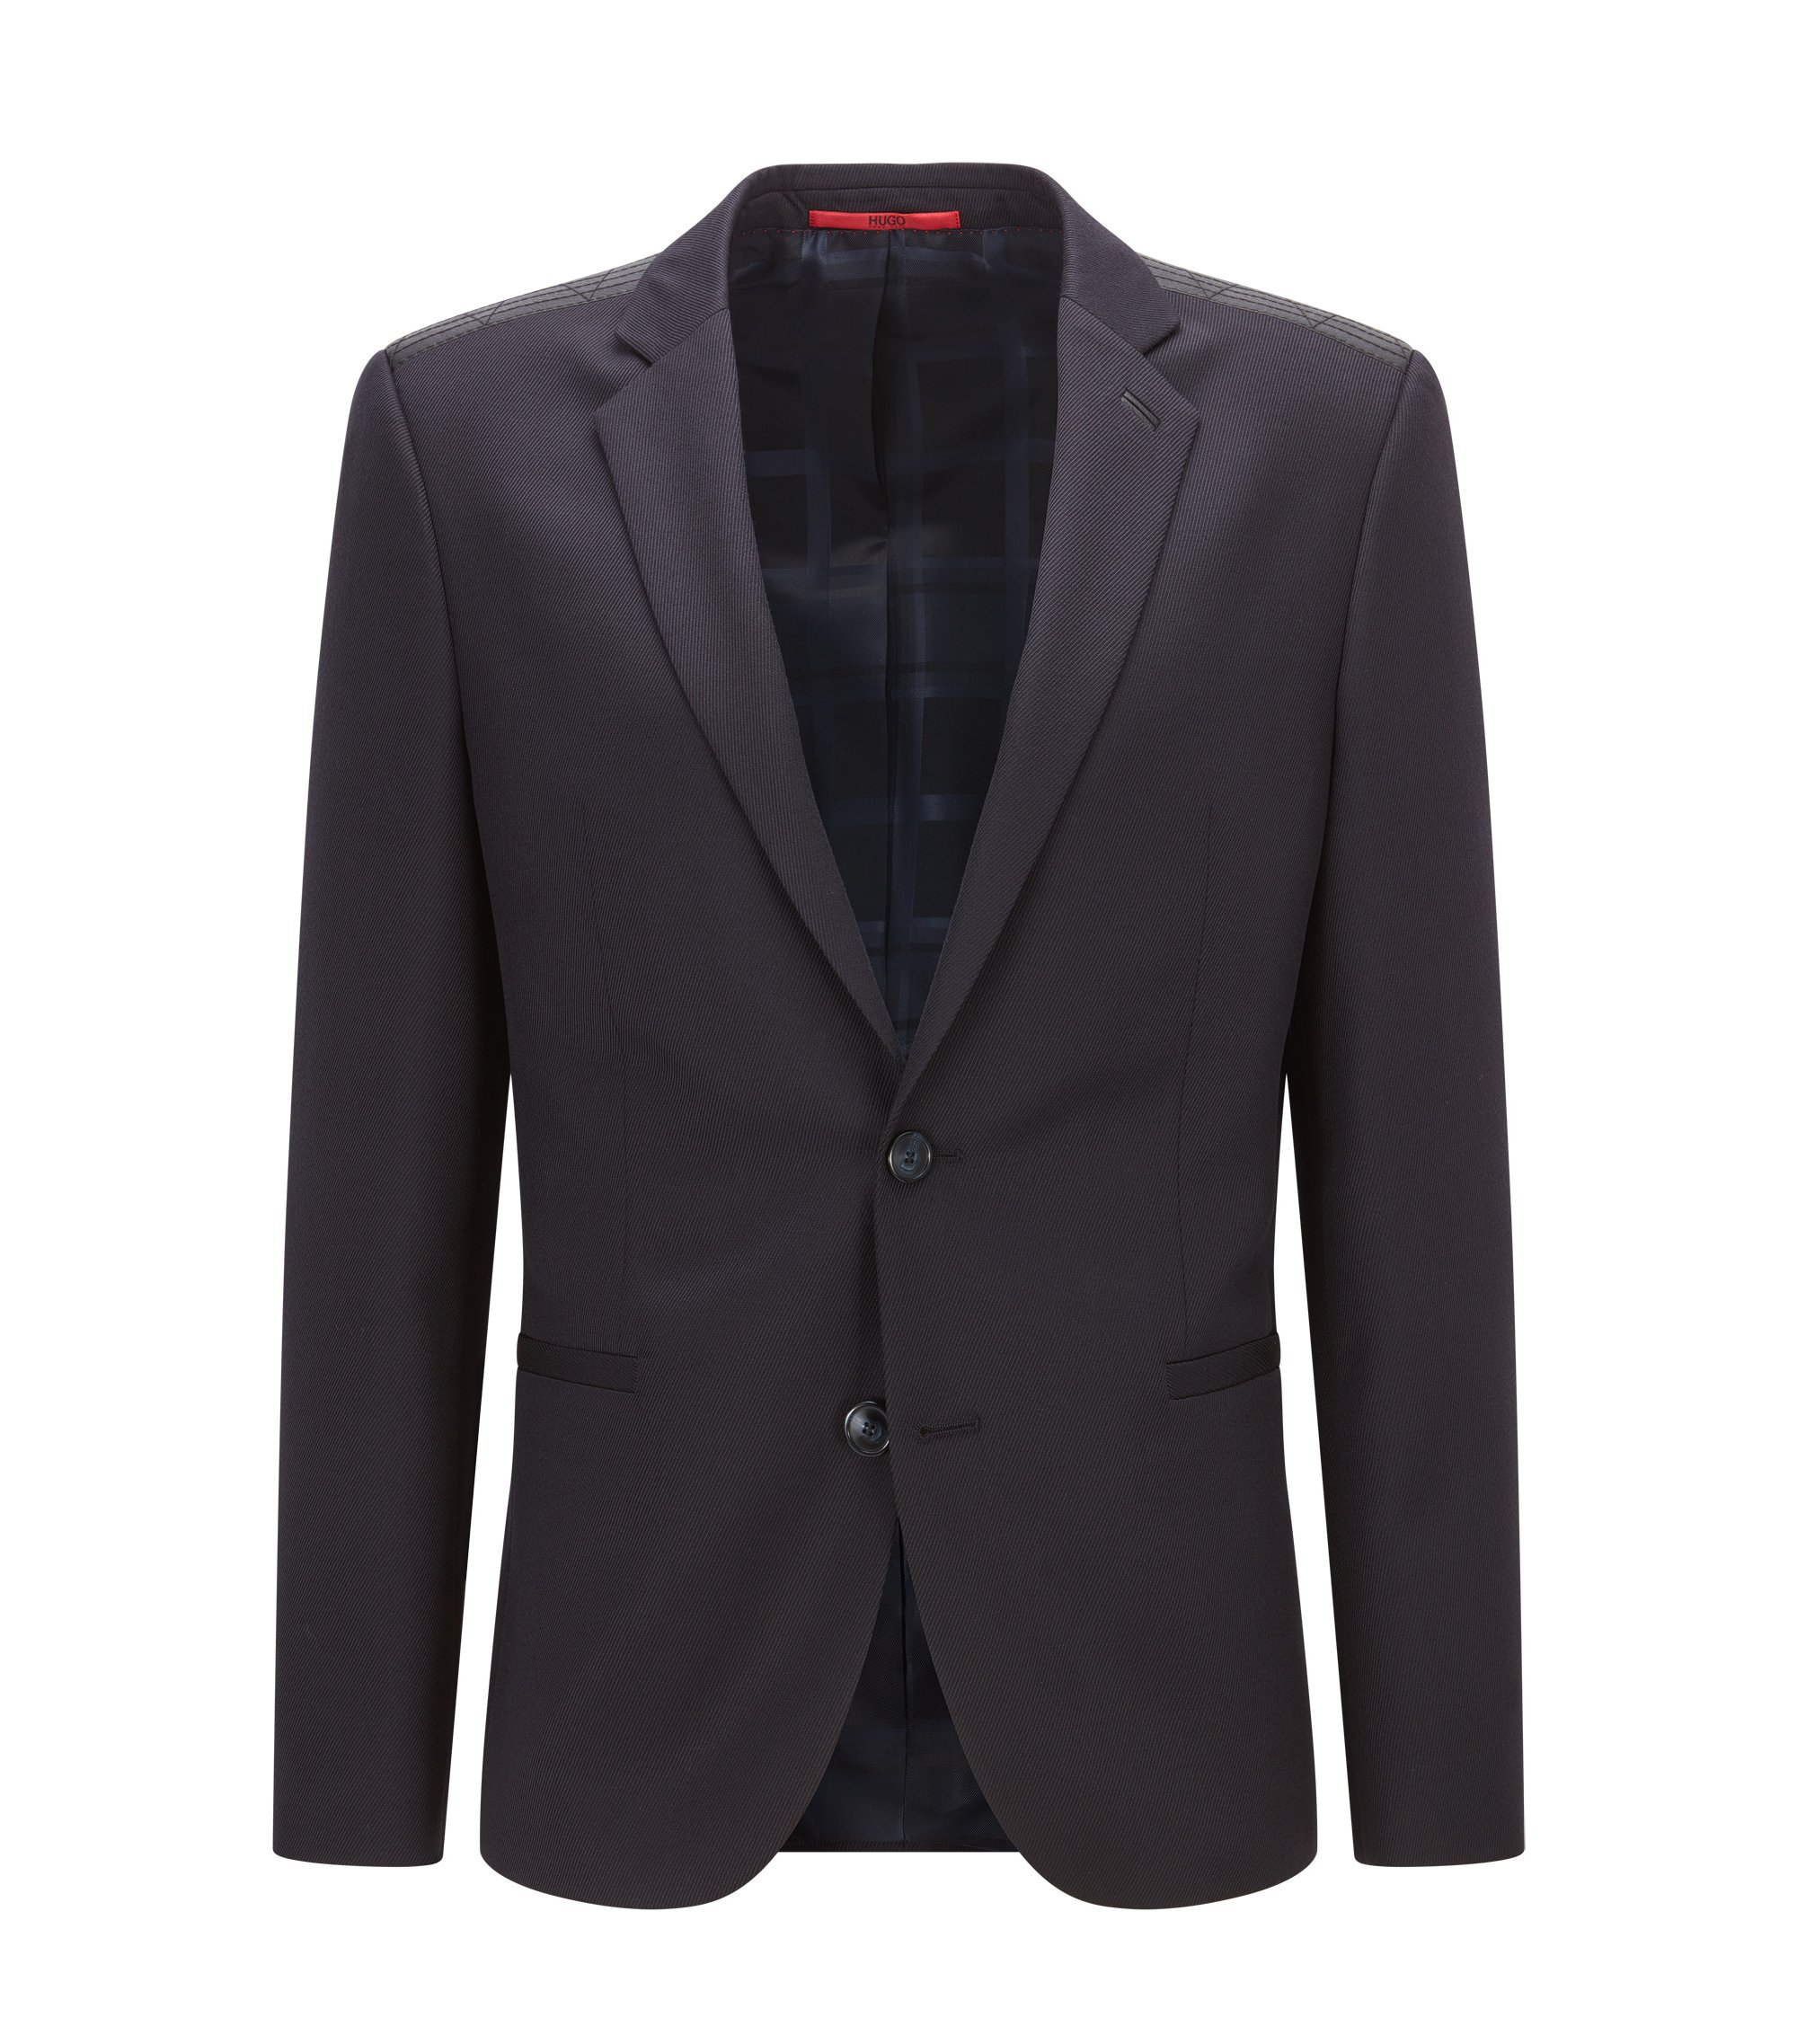 Giacca extra slim fit in lana vergine con guarnizione in pelle, Blu scuro